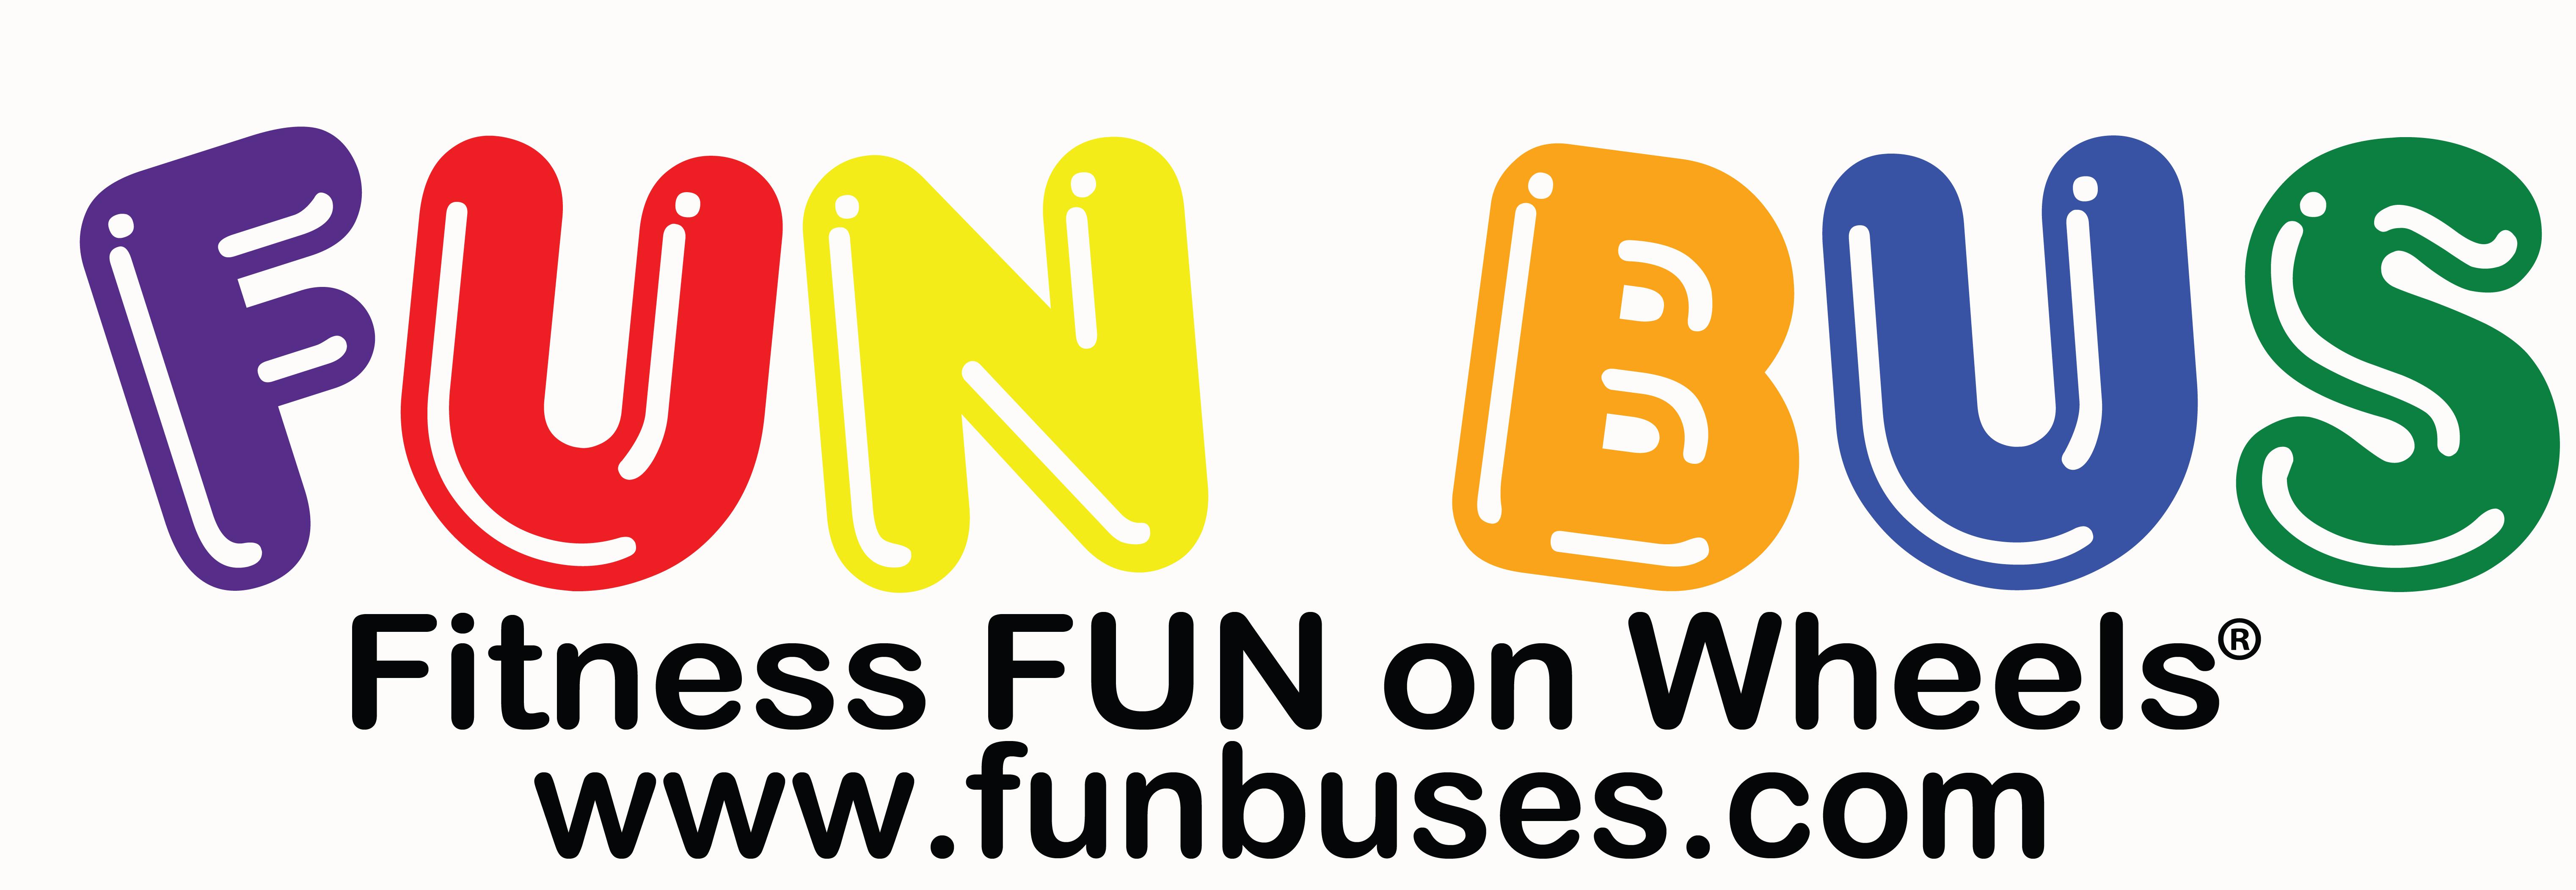 FunBusLogoTagwebblack.jpg